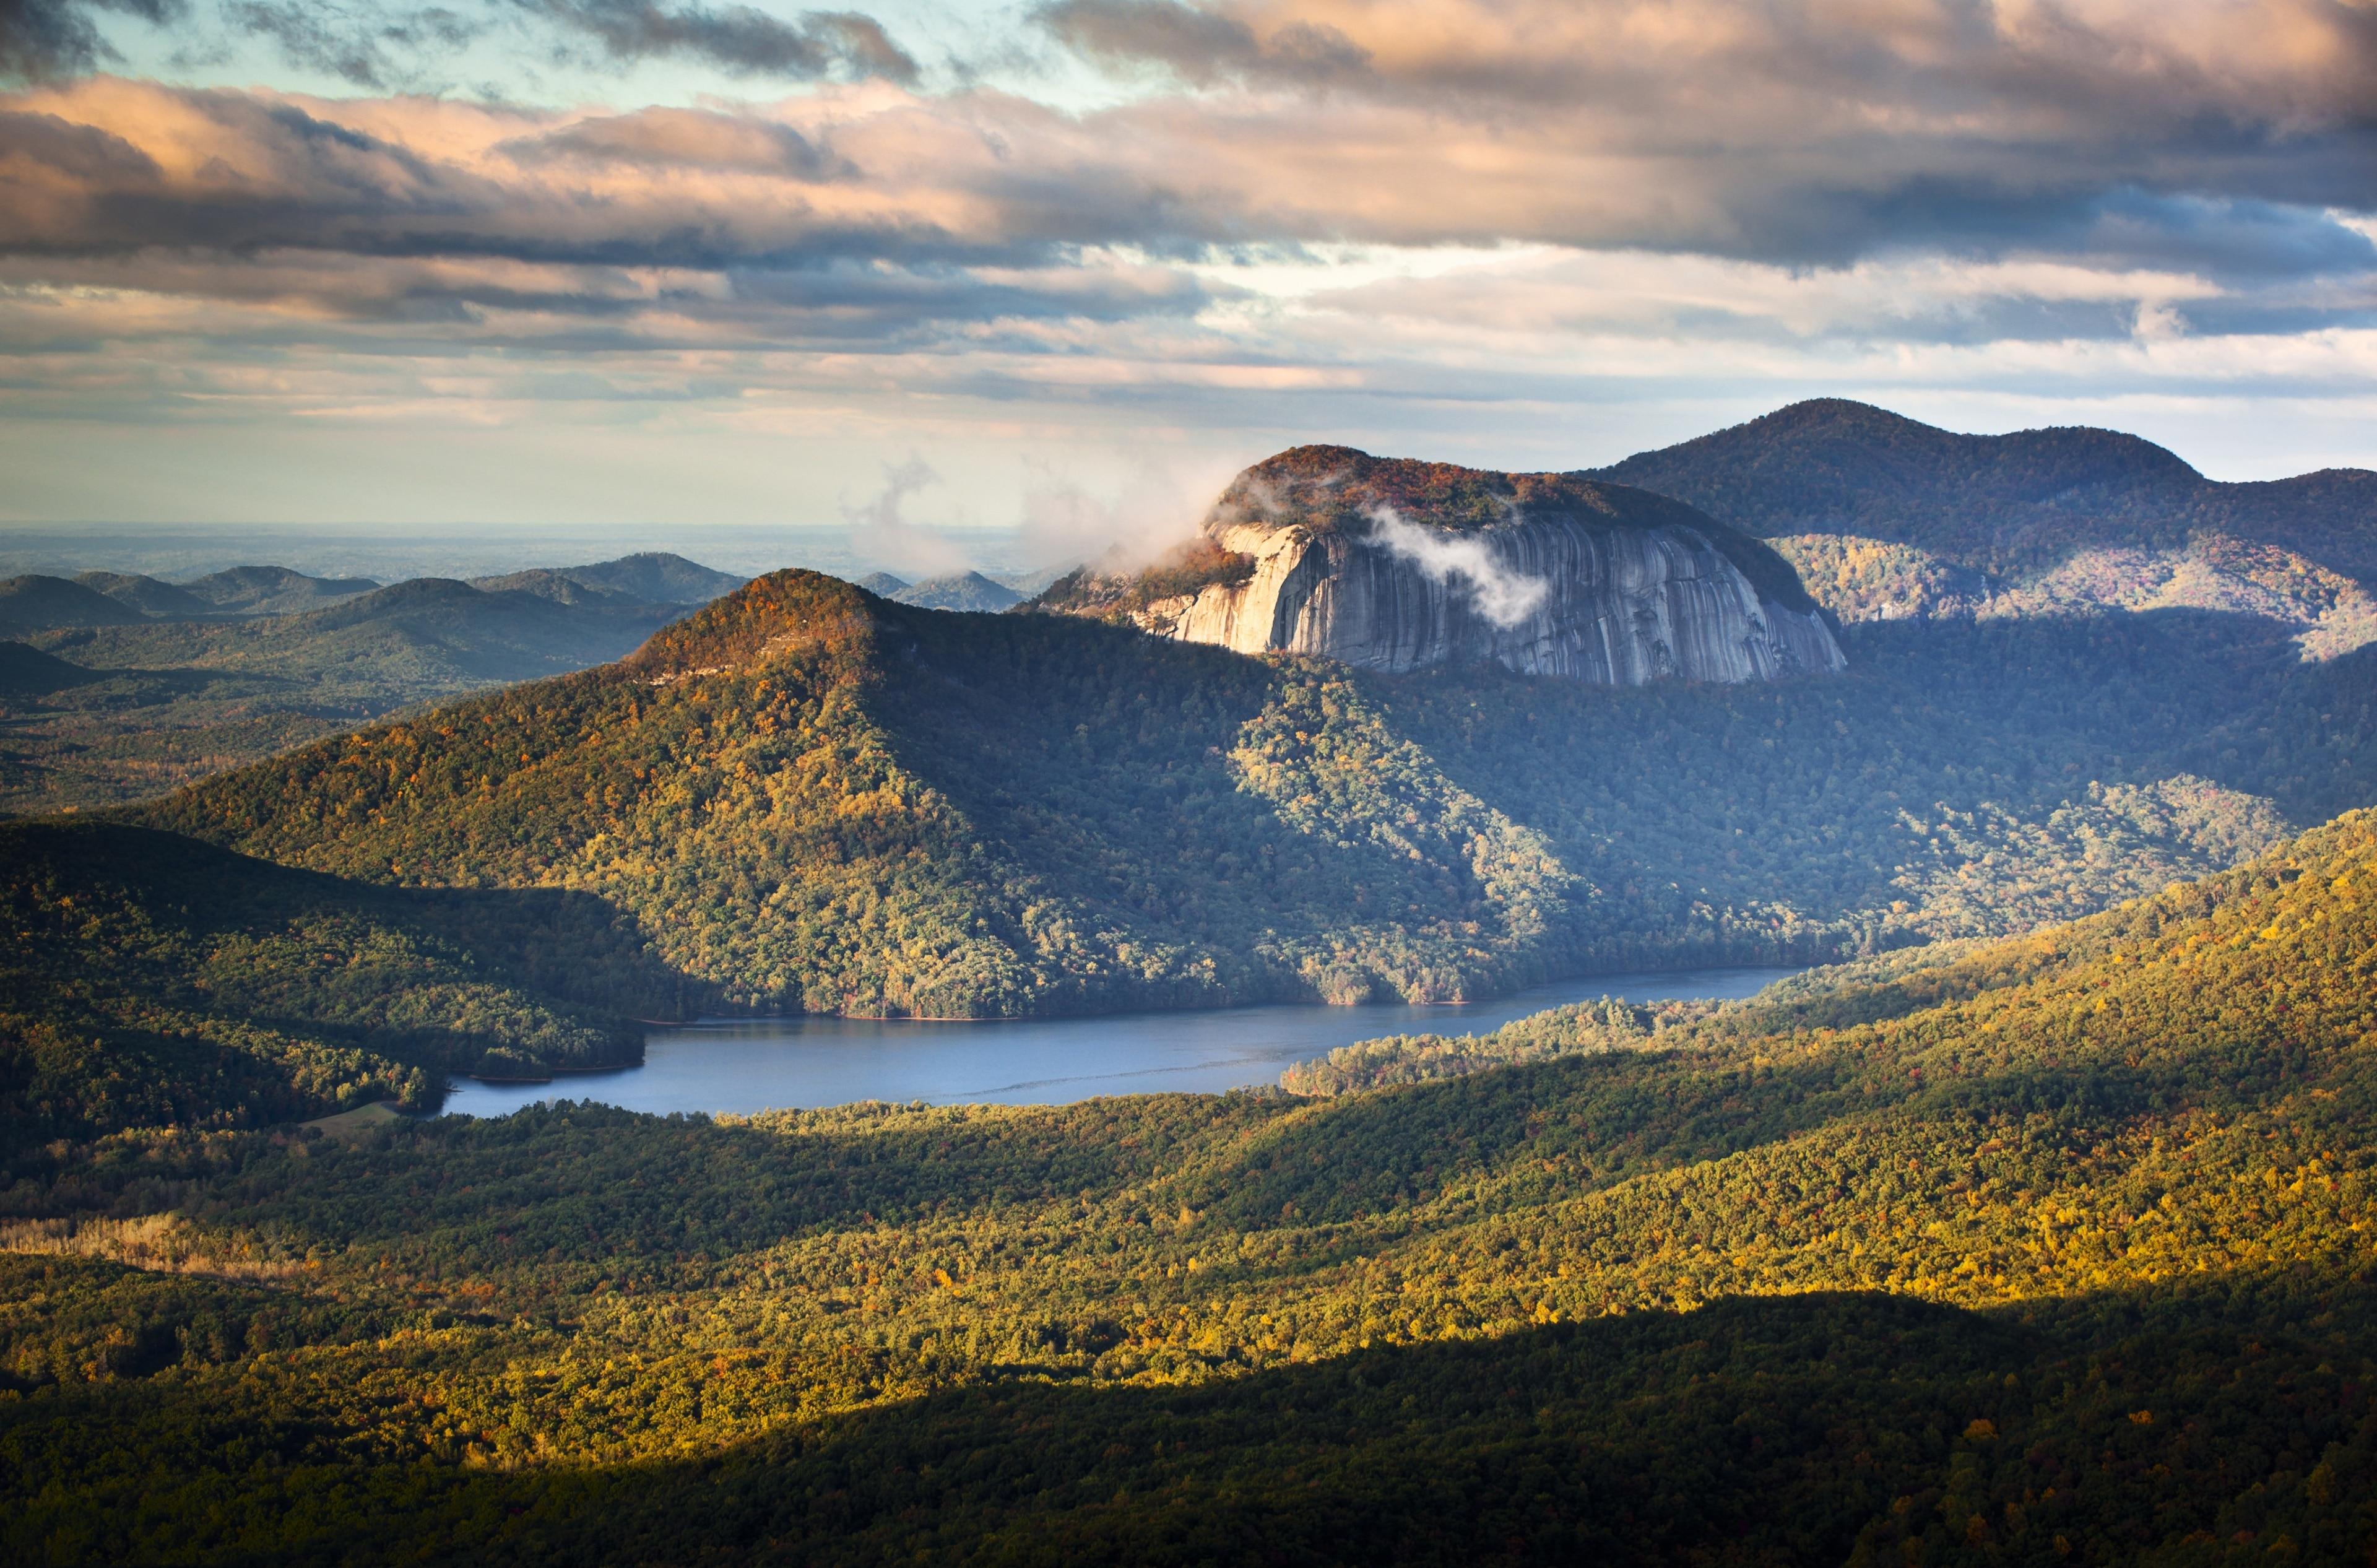 Table Rock State Park, Pickens, South Carolina, USA